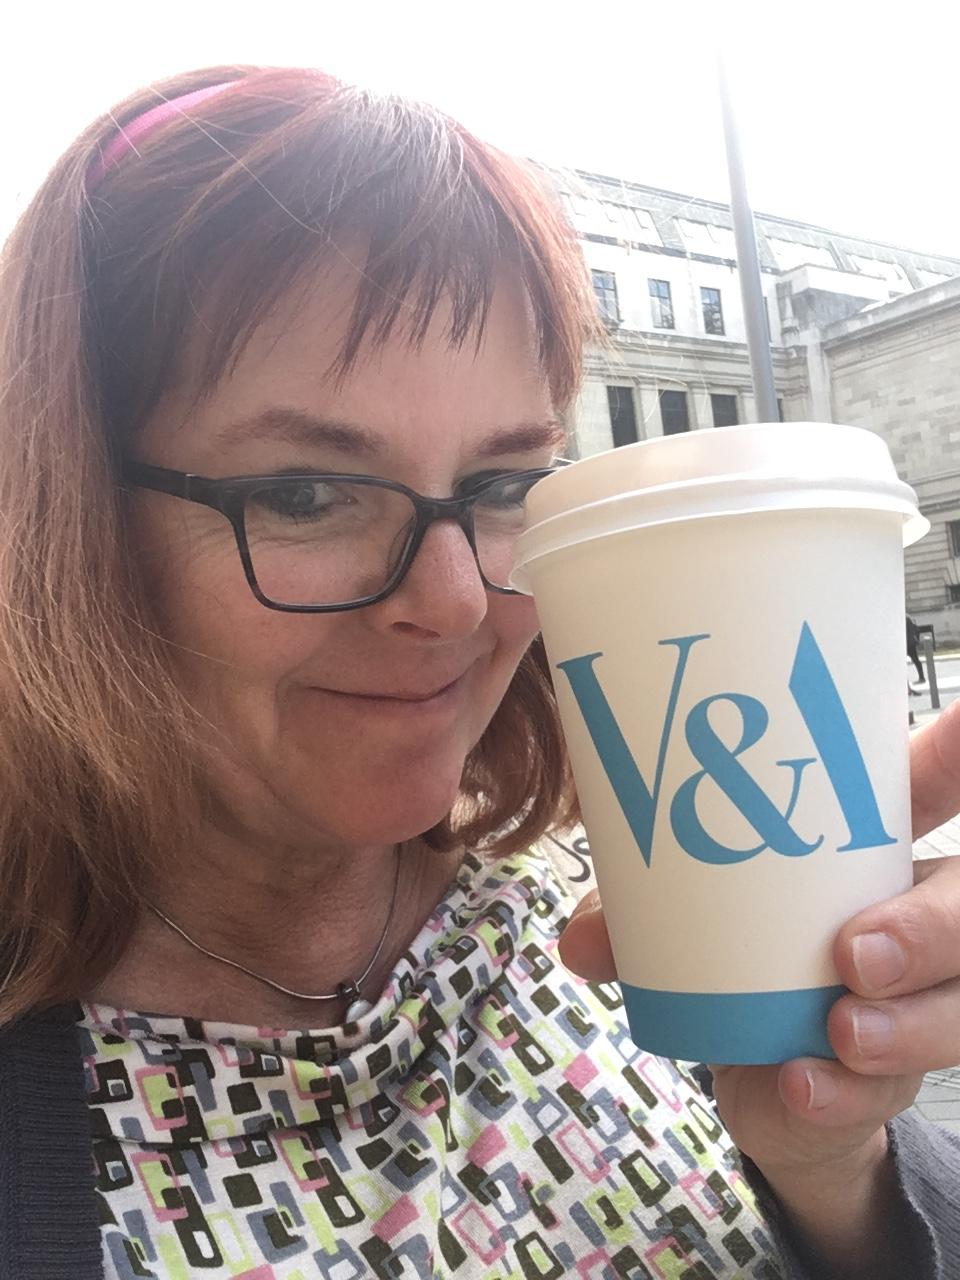 VA coffee